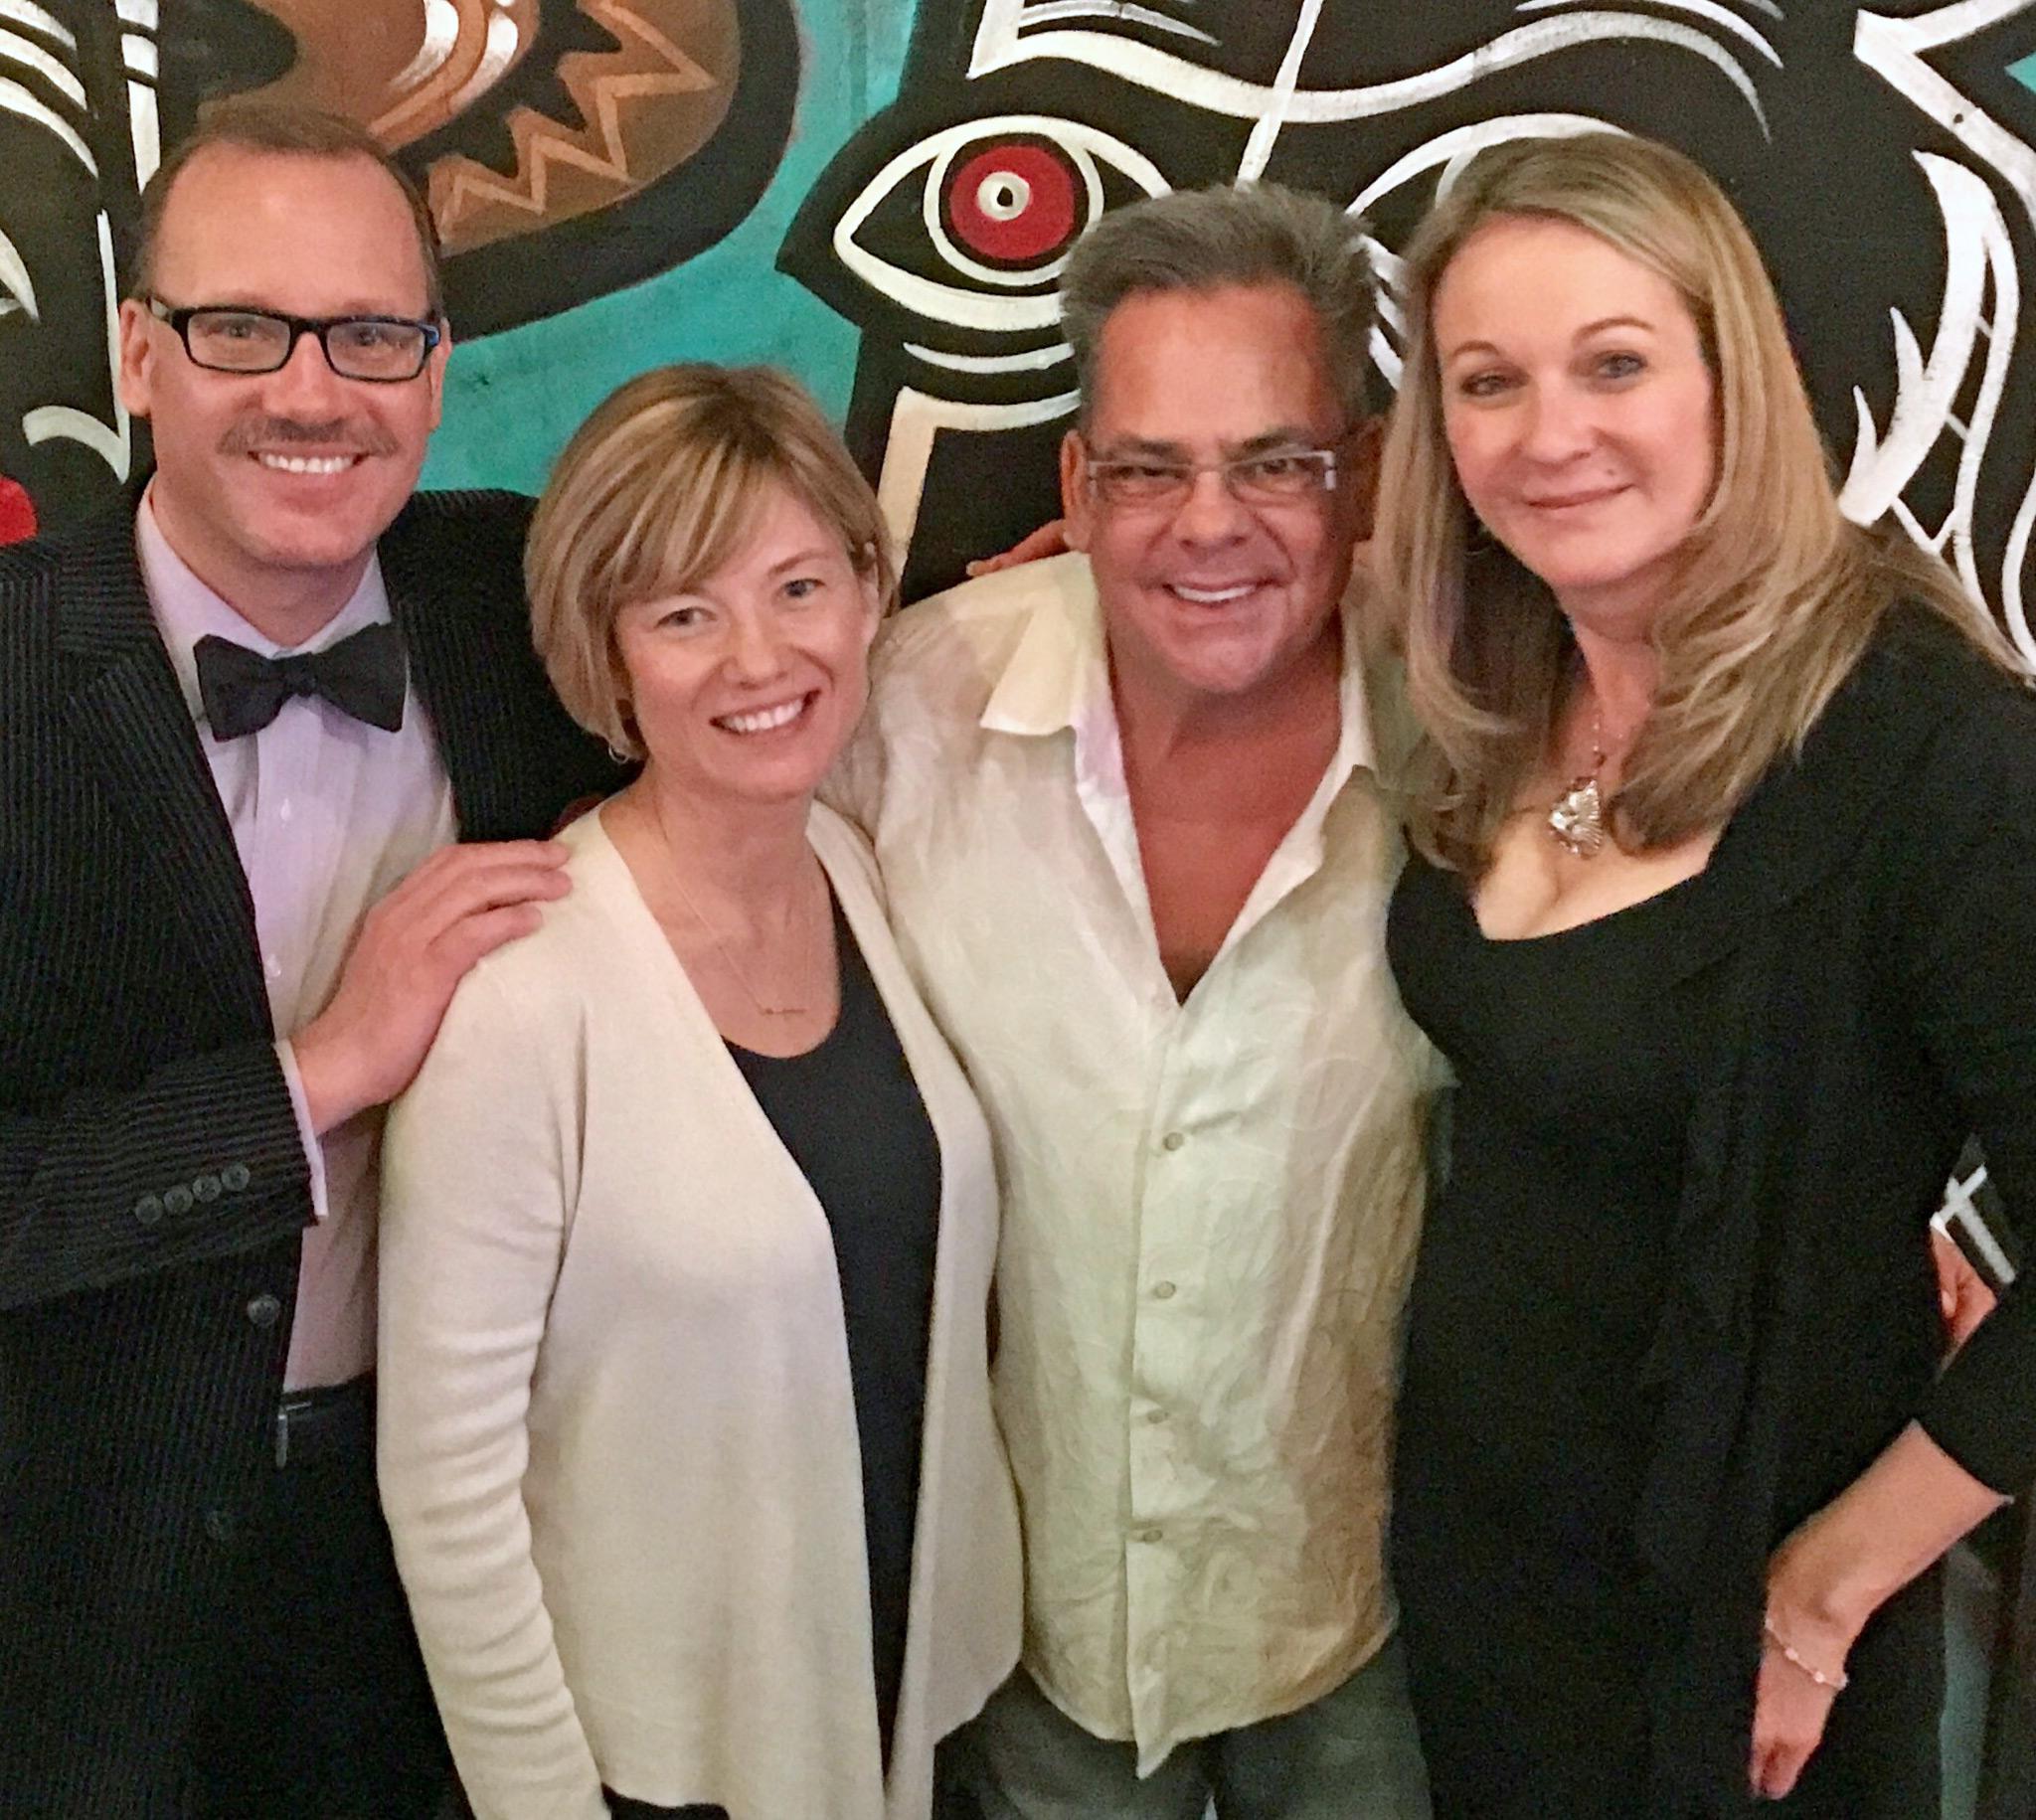 Kevin Godbee, Bobbi Matson, Louie Spetrini, Lori Brown